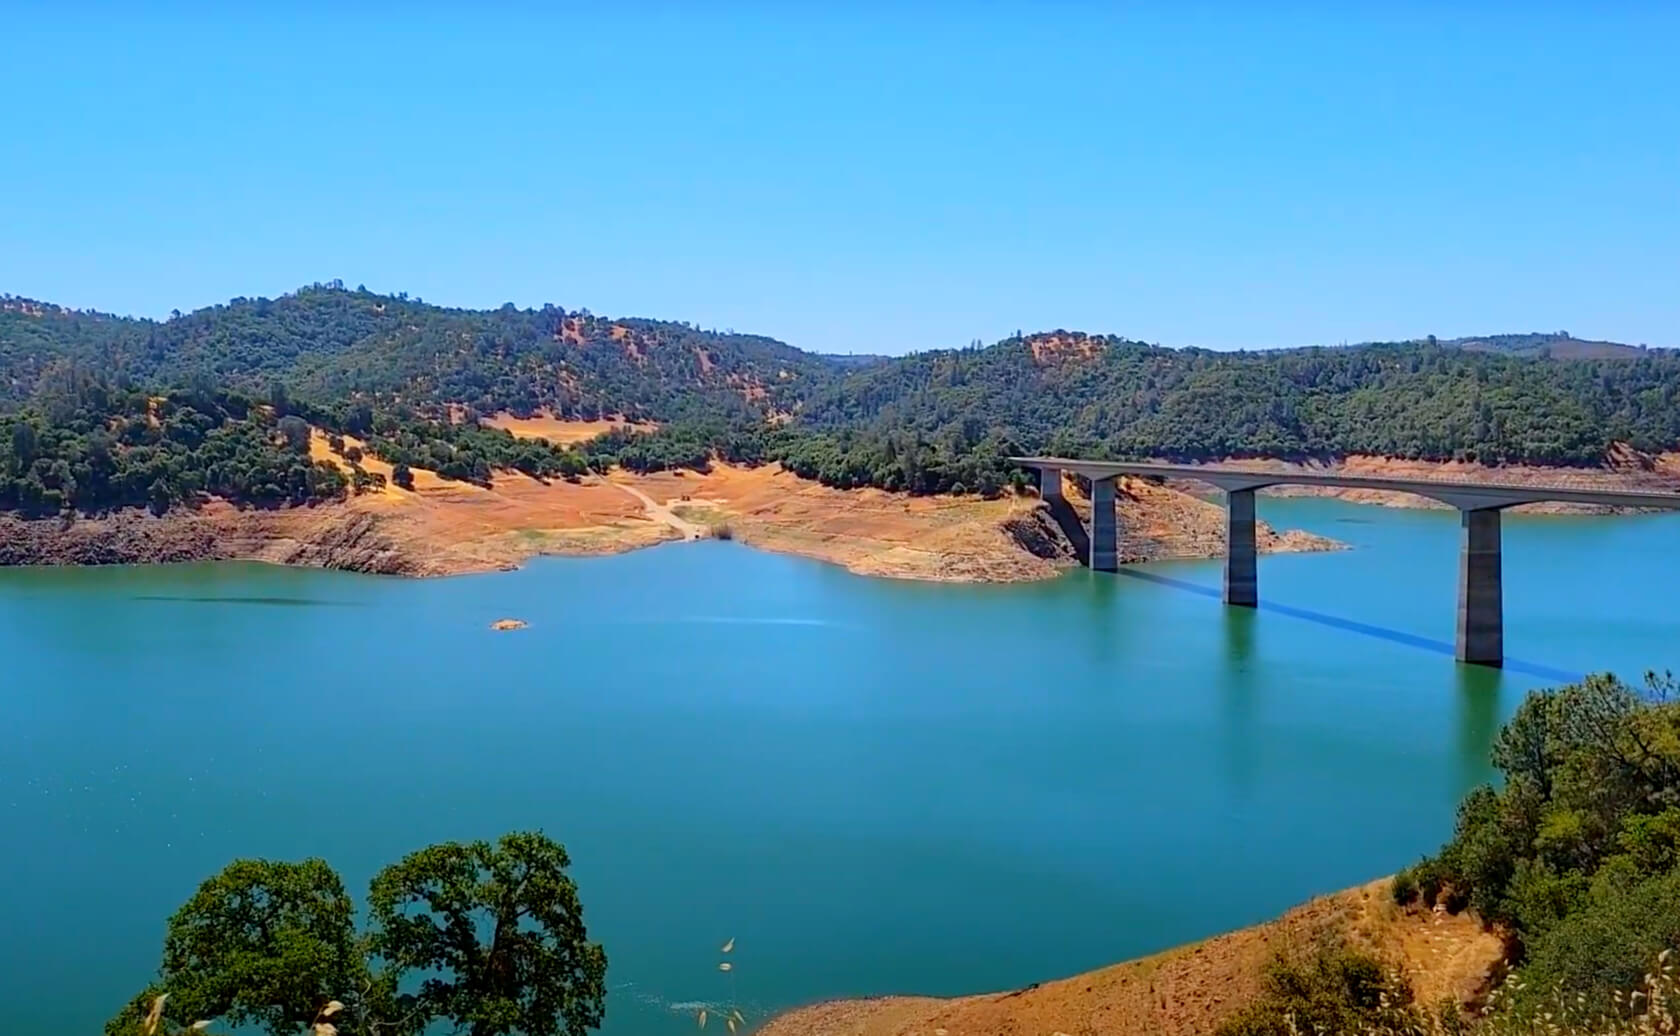 New-Melones-Lake-Fishing-Guide-Report-California-10